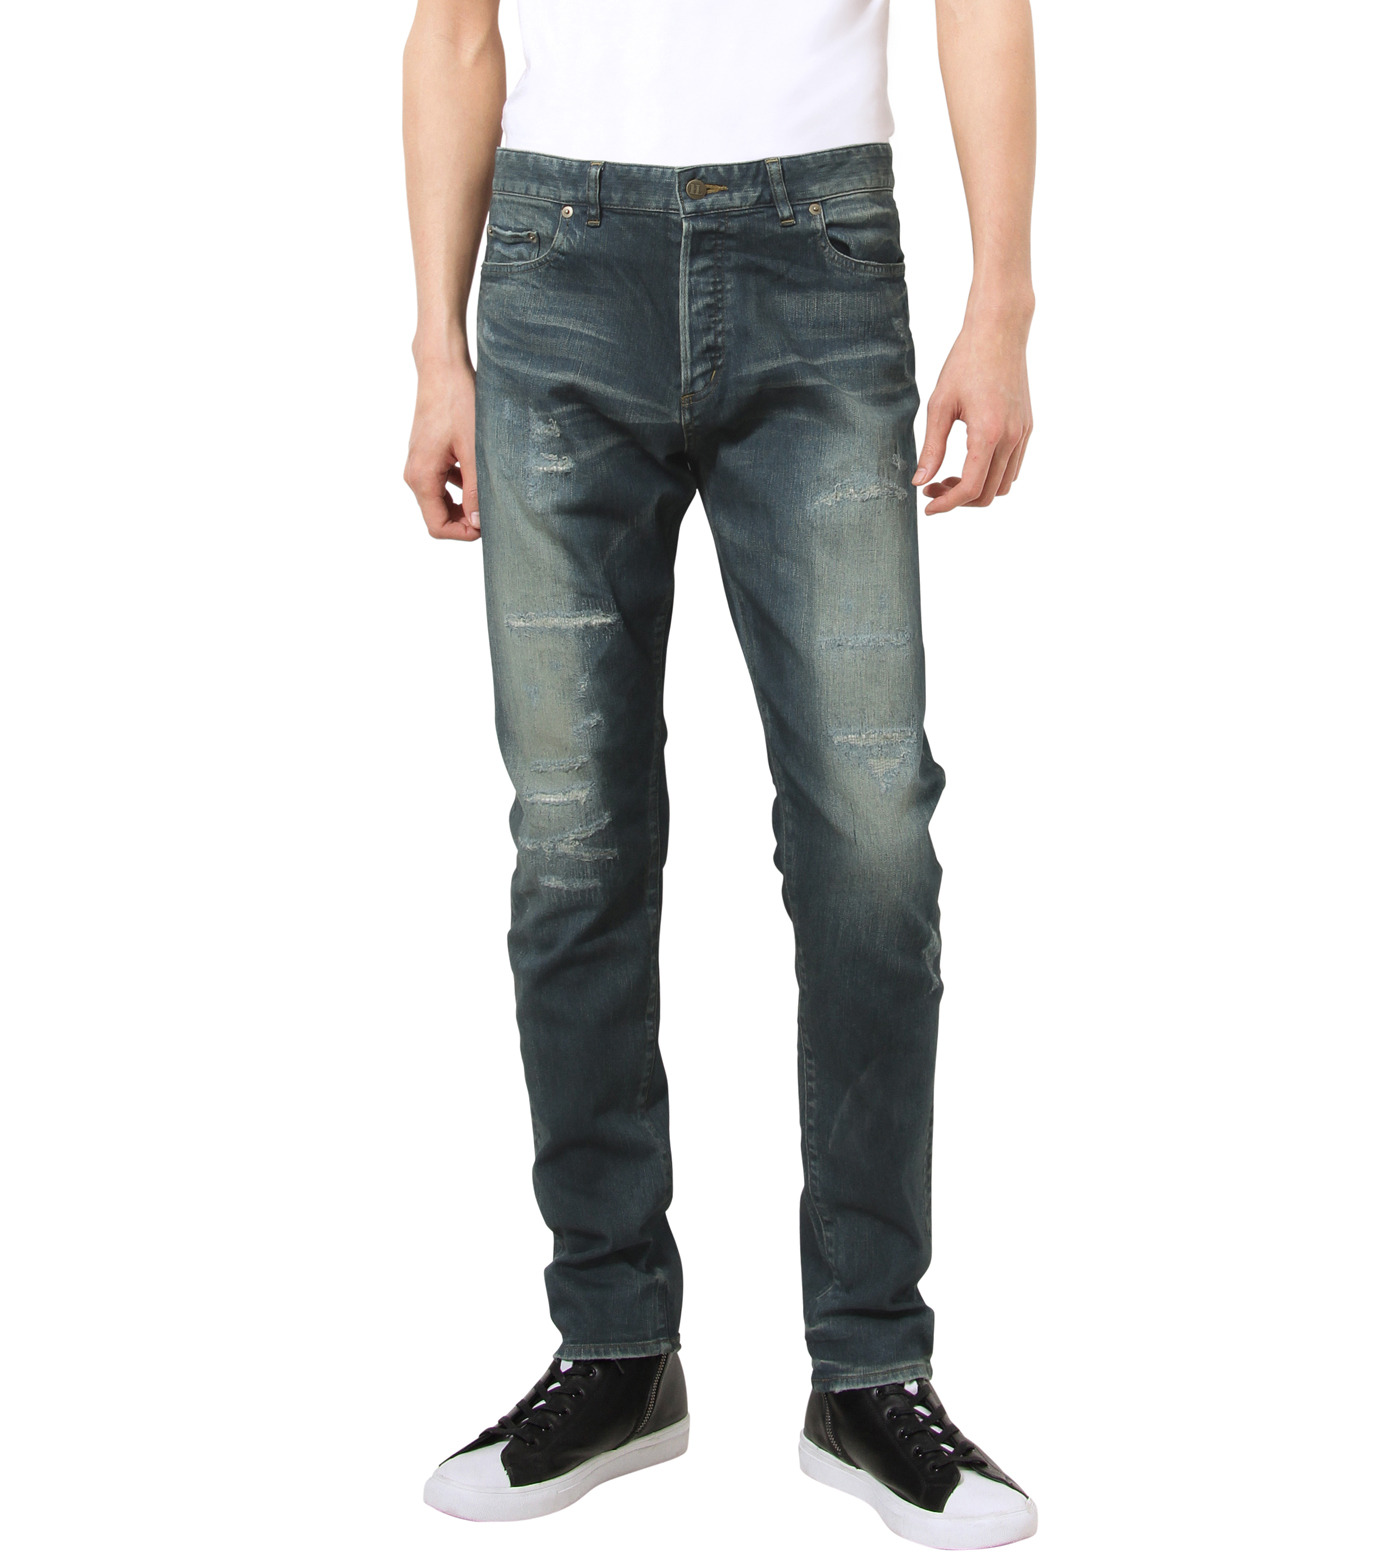 HL HEDDIE LOVU(エイチエル・エディールーヴ)のIND Dark Damage-INDIGO(パンツ/pants)-17A98006-94 拡大詳細画像1